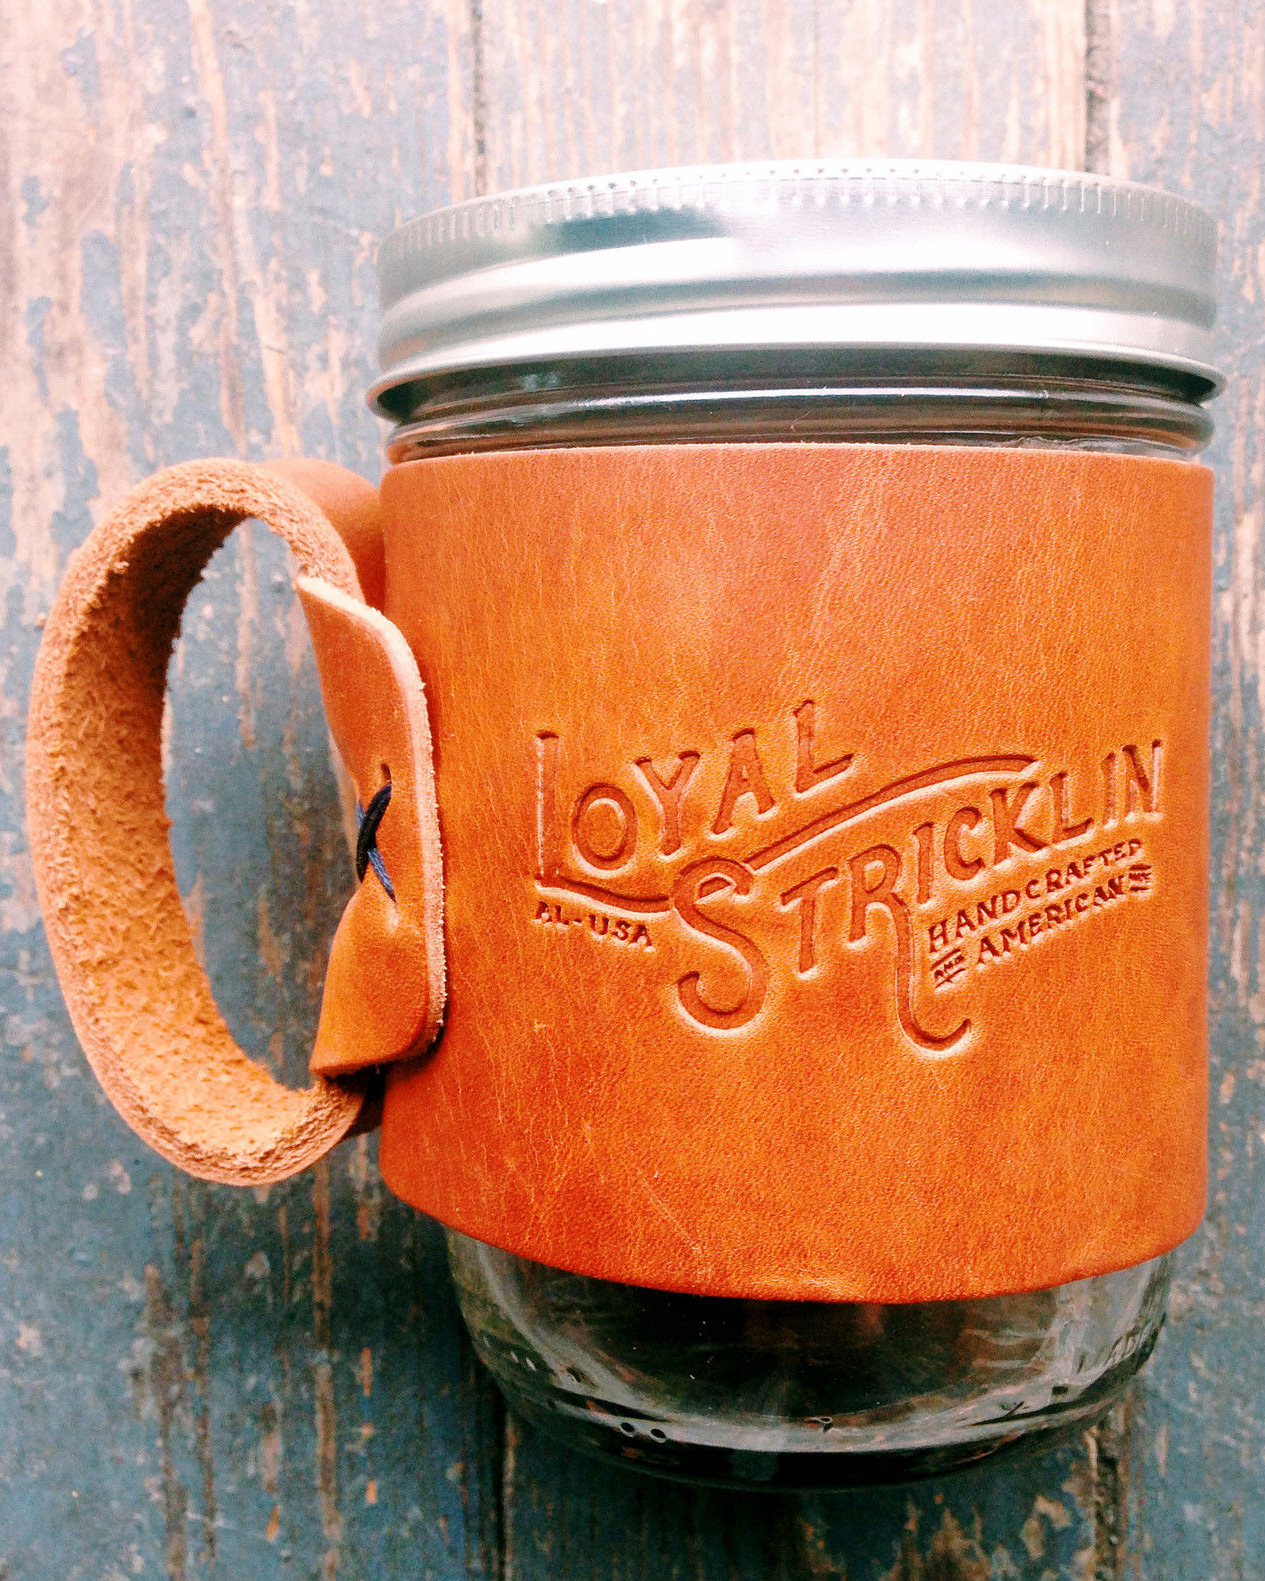 coffee-gift-guide-loyalstricklin-mug-1014.jpg